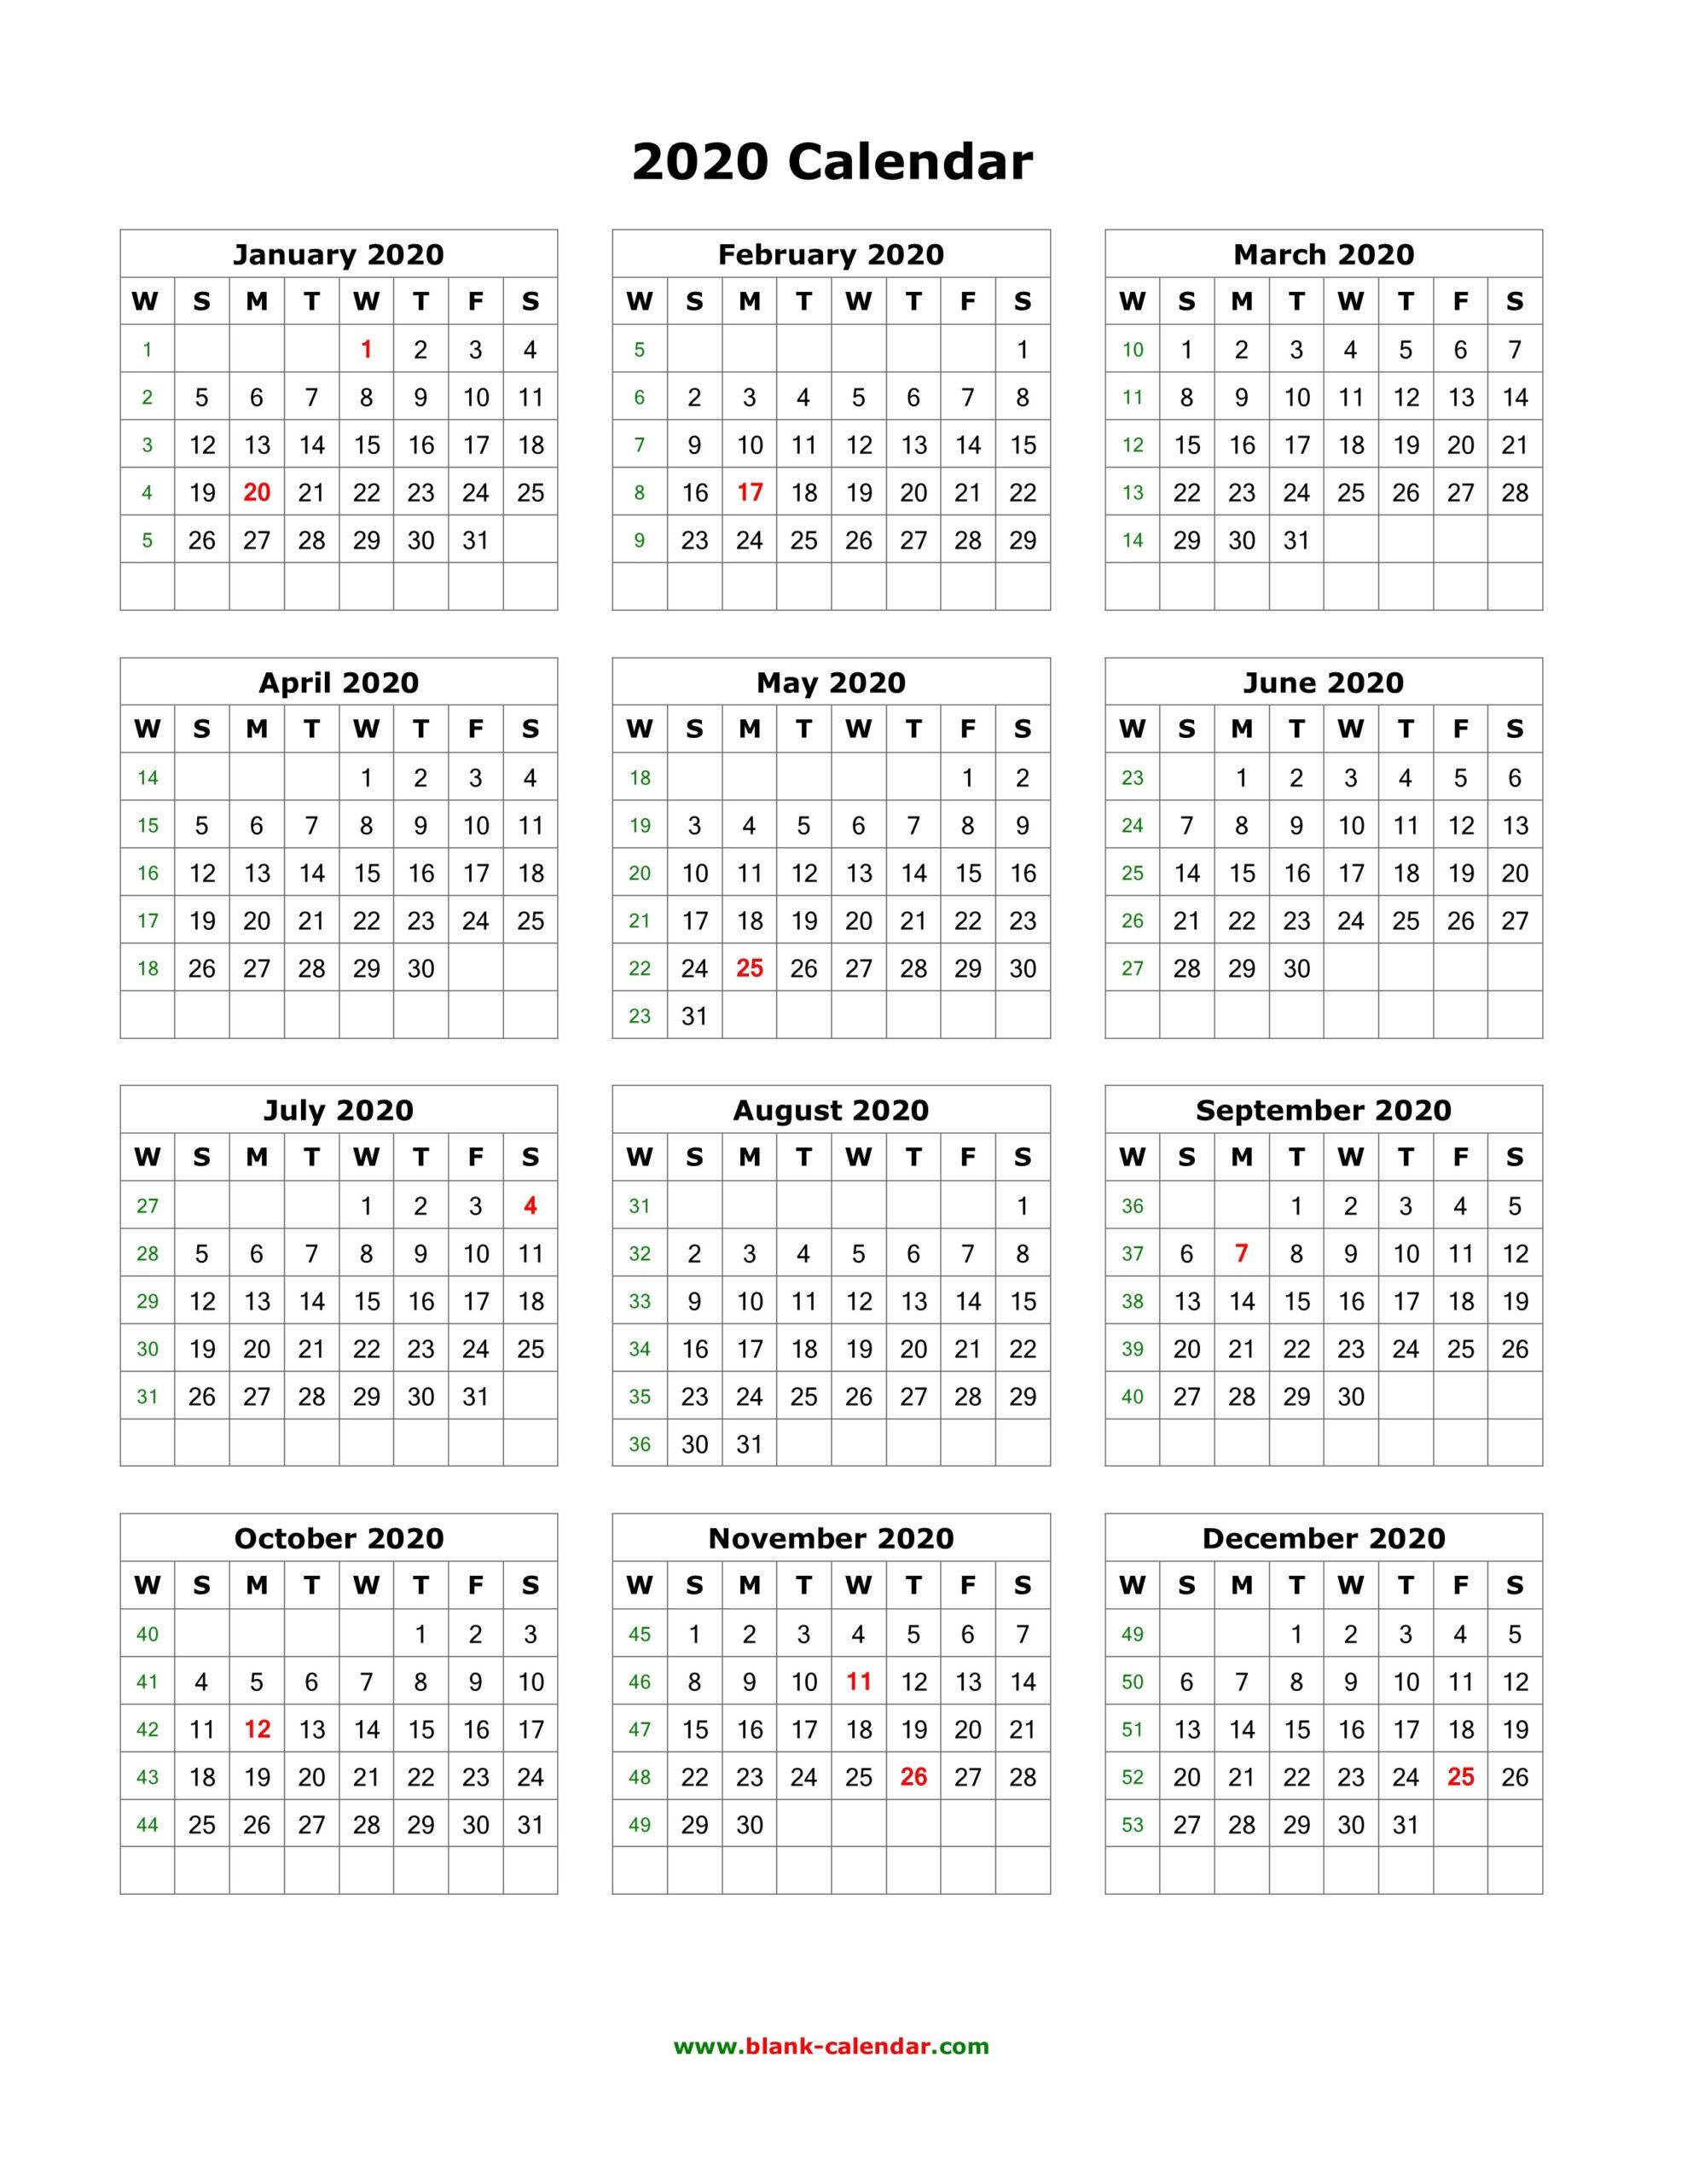 Free Printable 12 Month Calendar 2020 | Qualads  Free Printable One Month Calendar